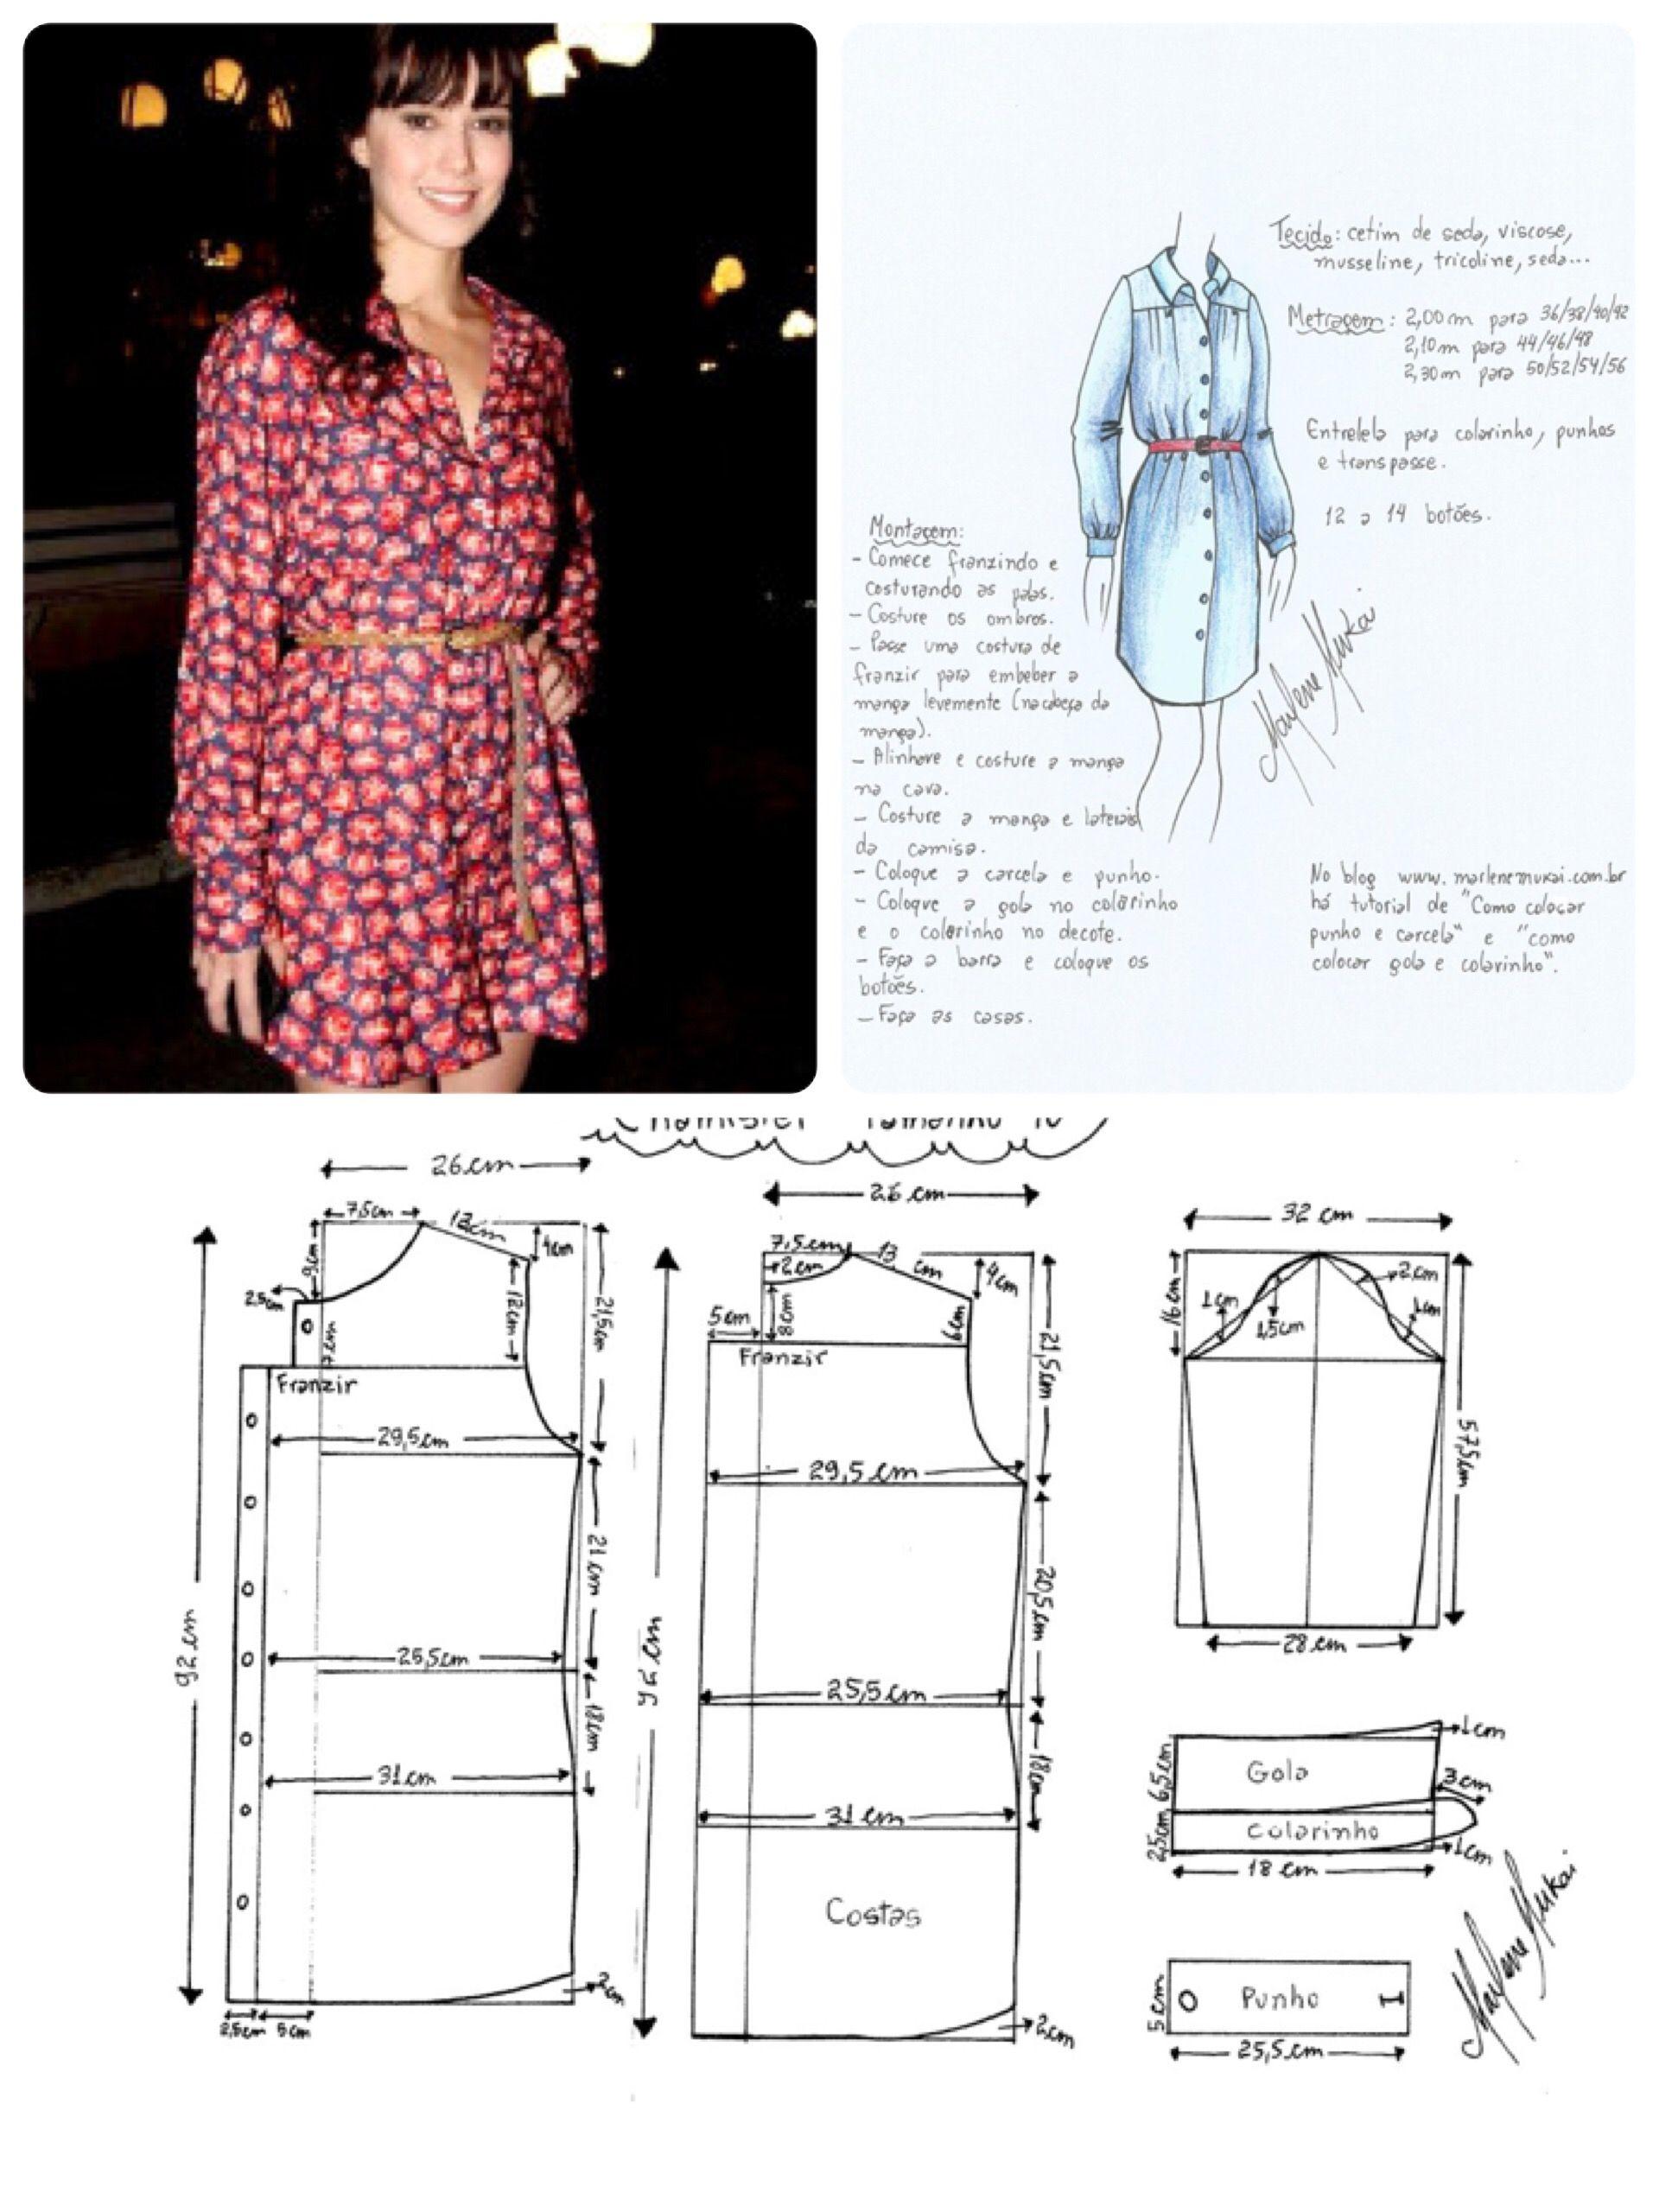 Dress pattern | patrones en 2018 | Pinterest | Molde, Costura y Patrones